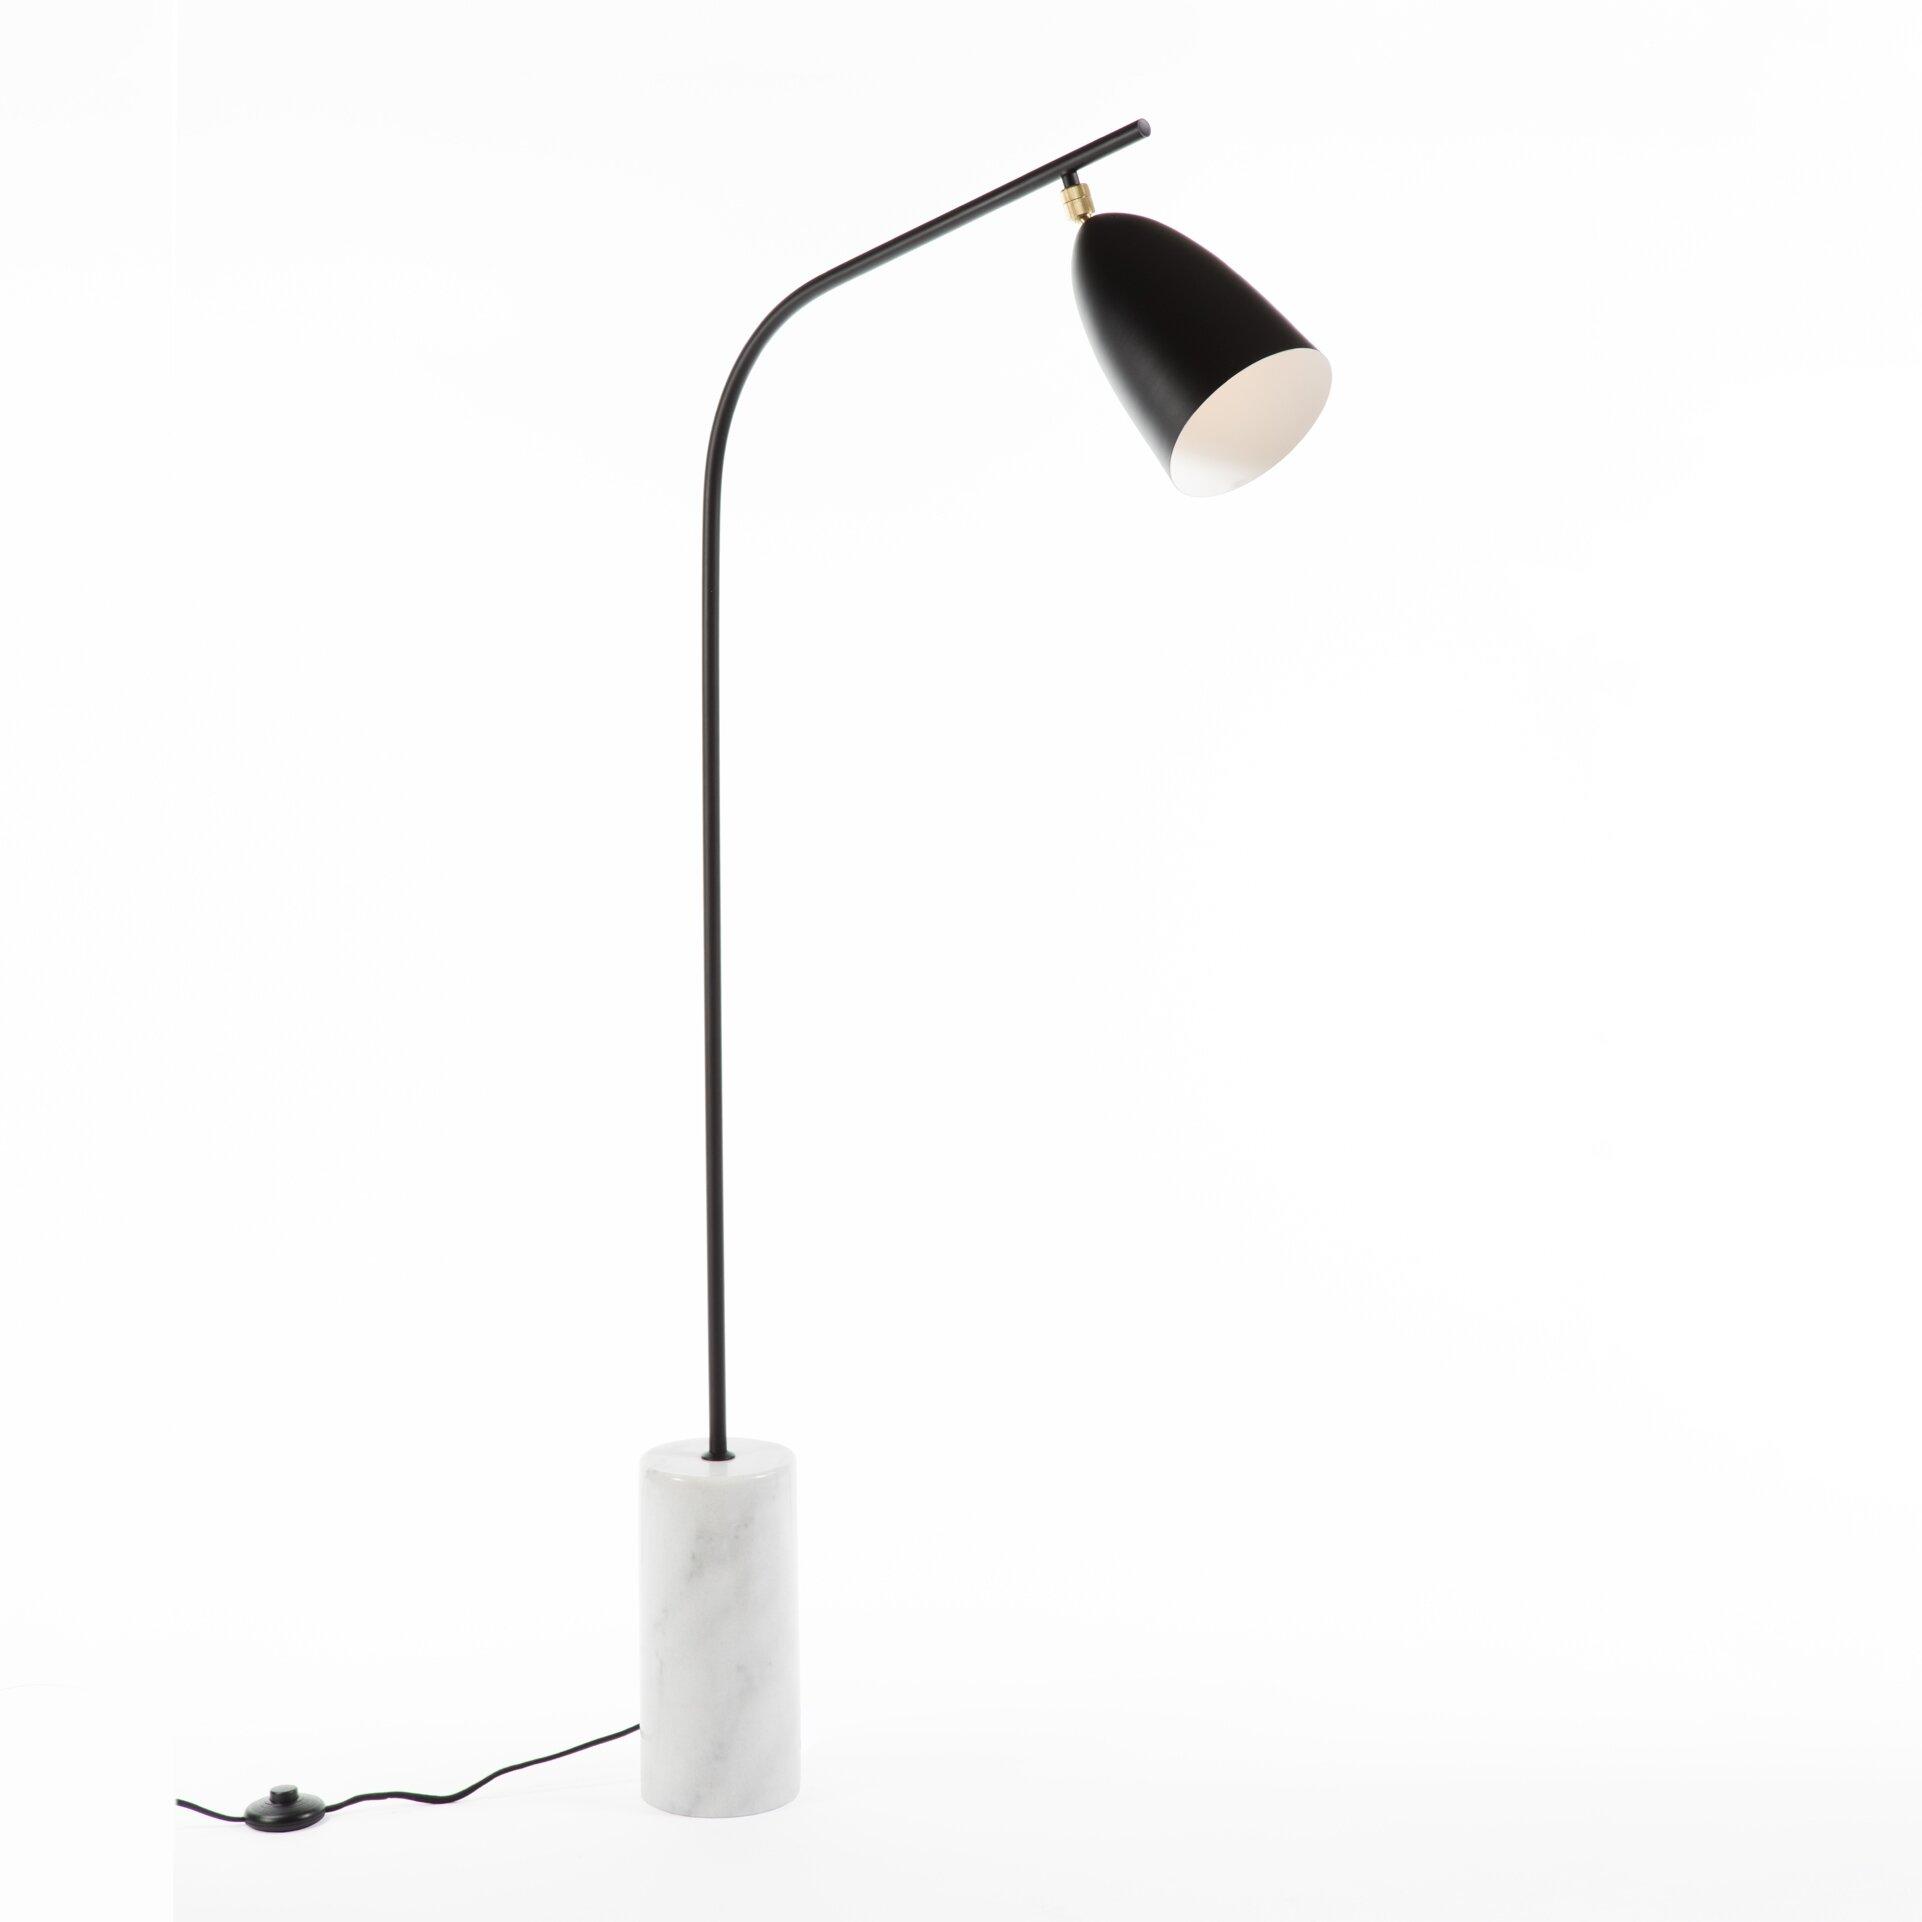 Galla home loren 59quot led task floor lamp wayfair for Pizzazz led floor lamp